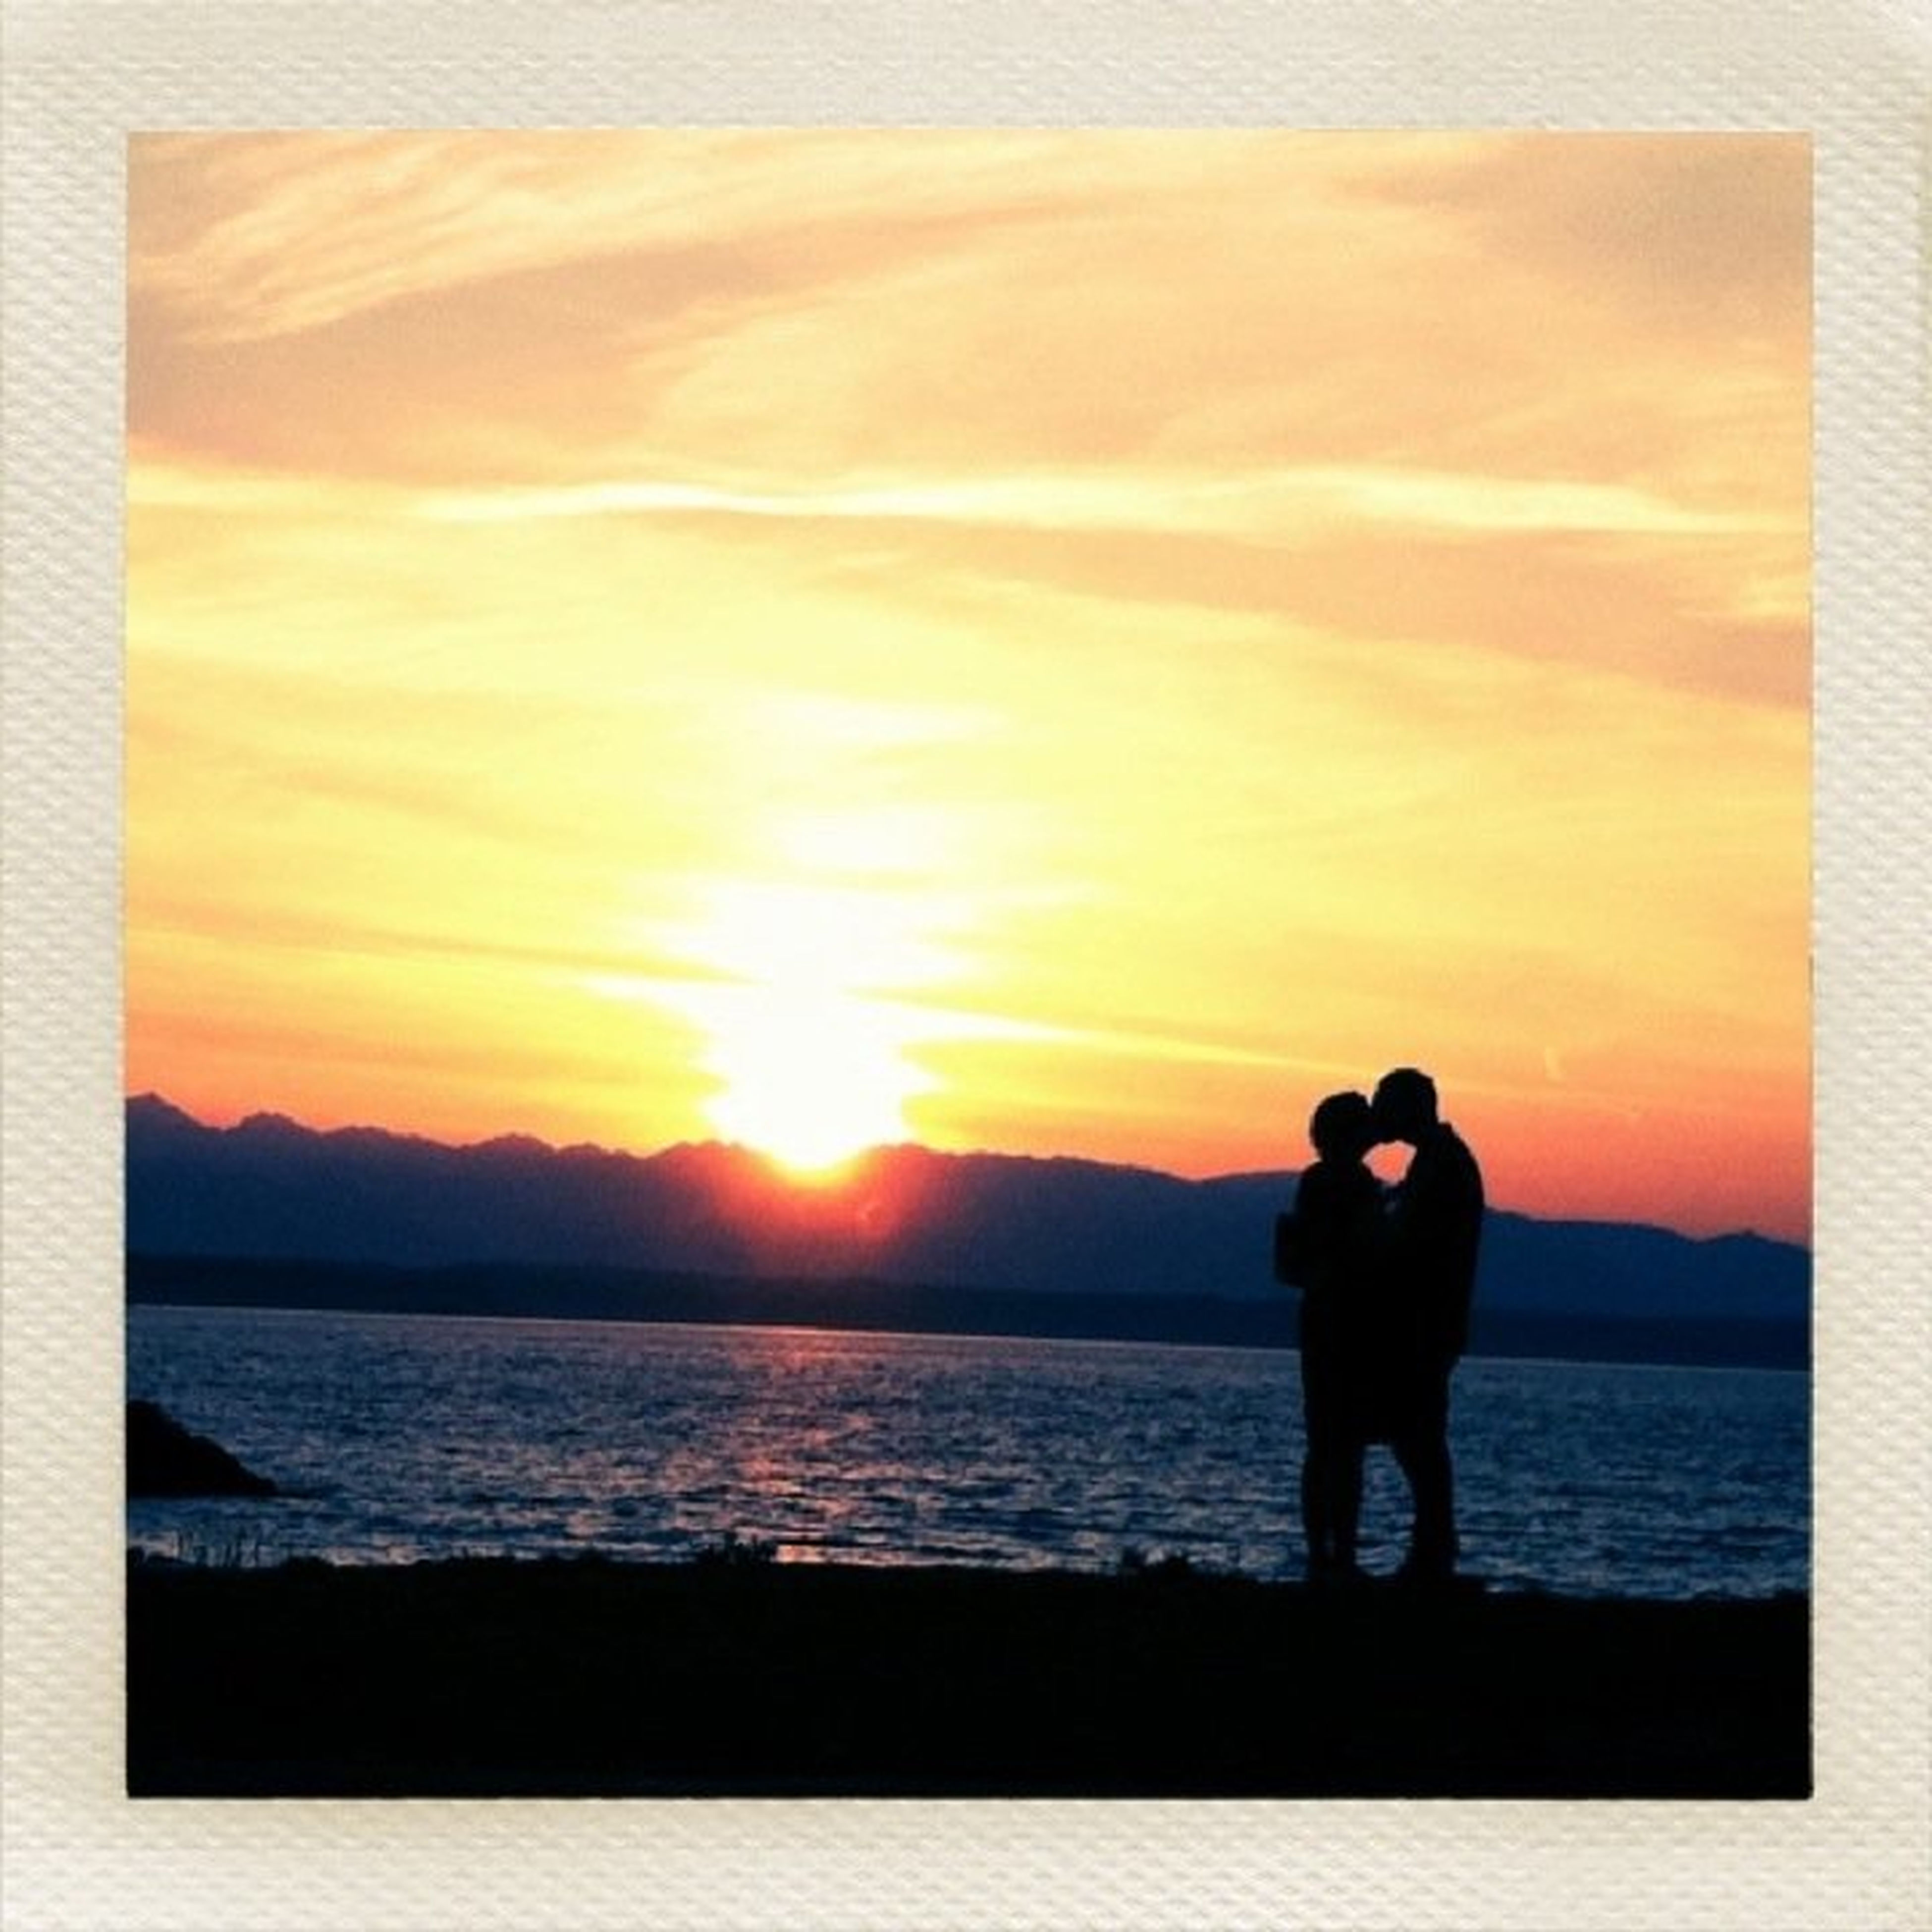 sunset, sea, silhouette, water, orange color, horizon over water, sun, lifestyles, sky, standing, leisure activity, men, beauty in nature, nature, scenics, sunlight, beach, full length